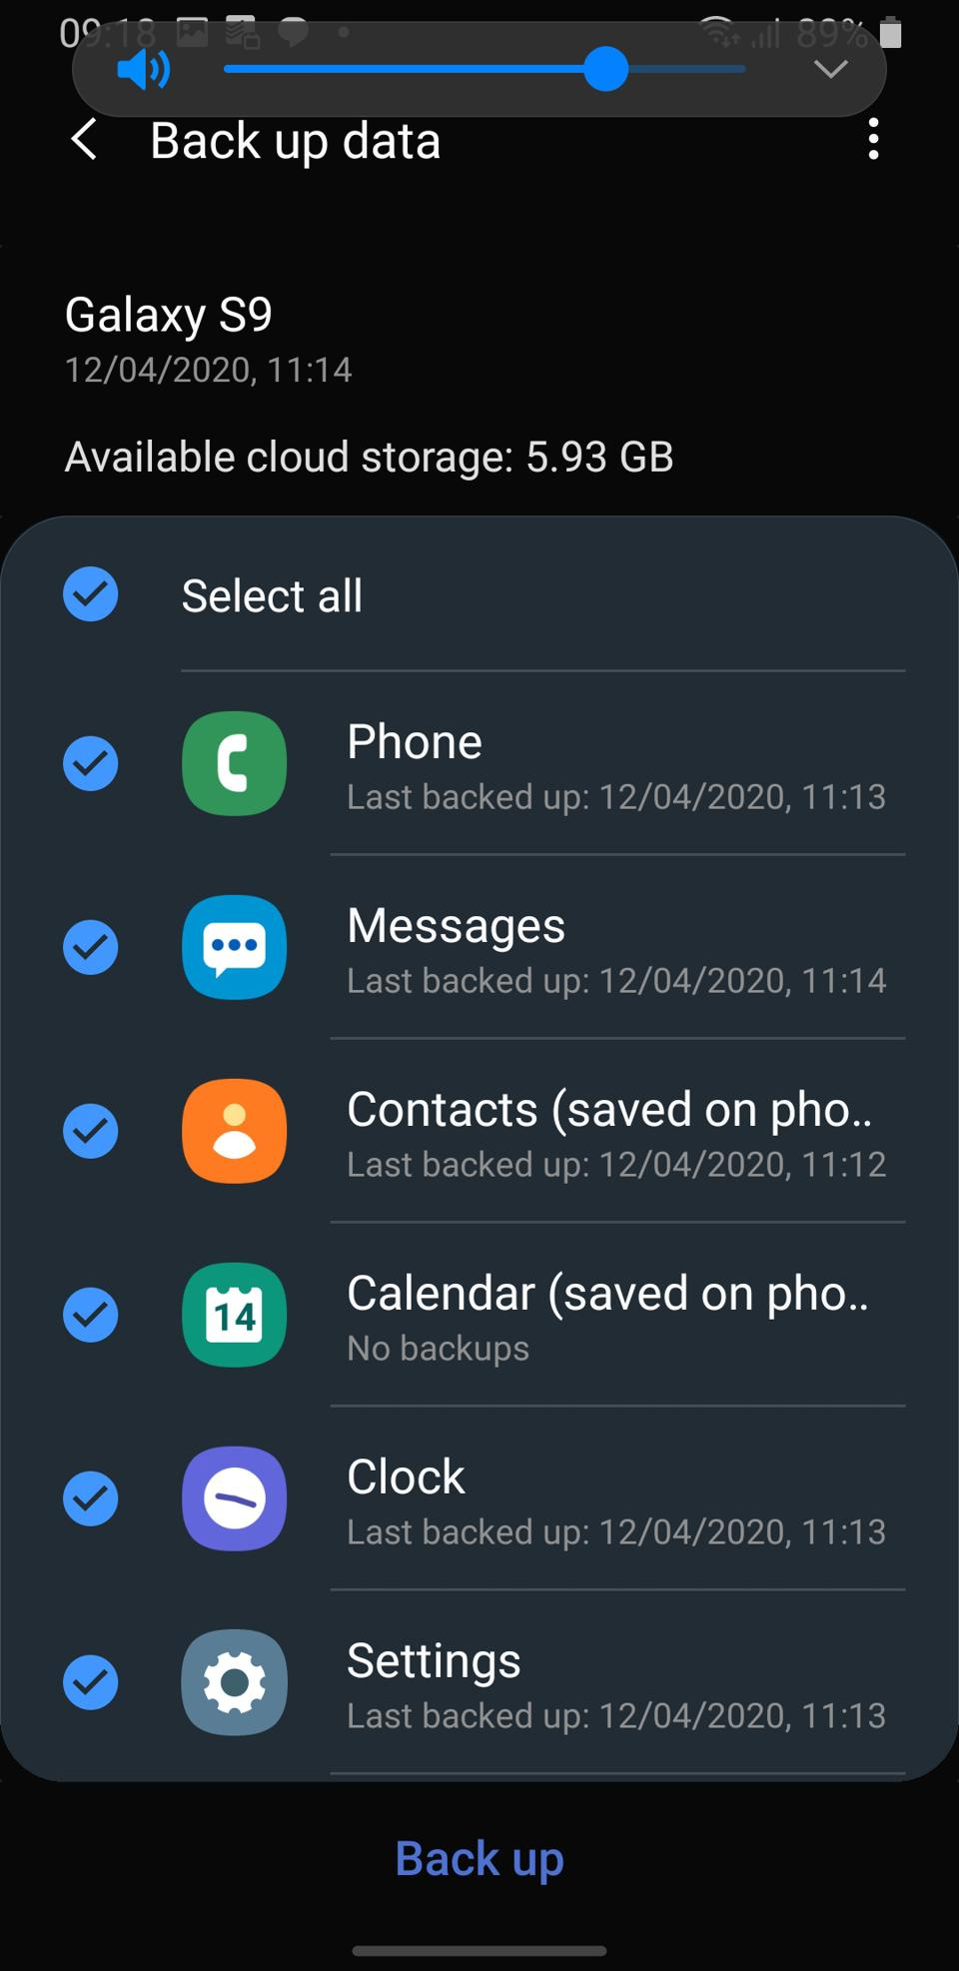 Samsung Galaxy backup settings